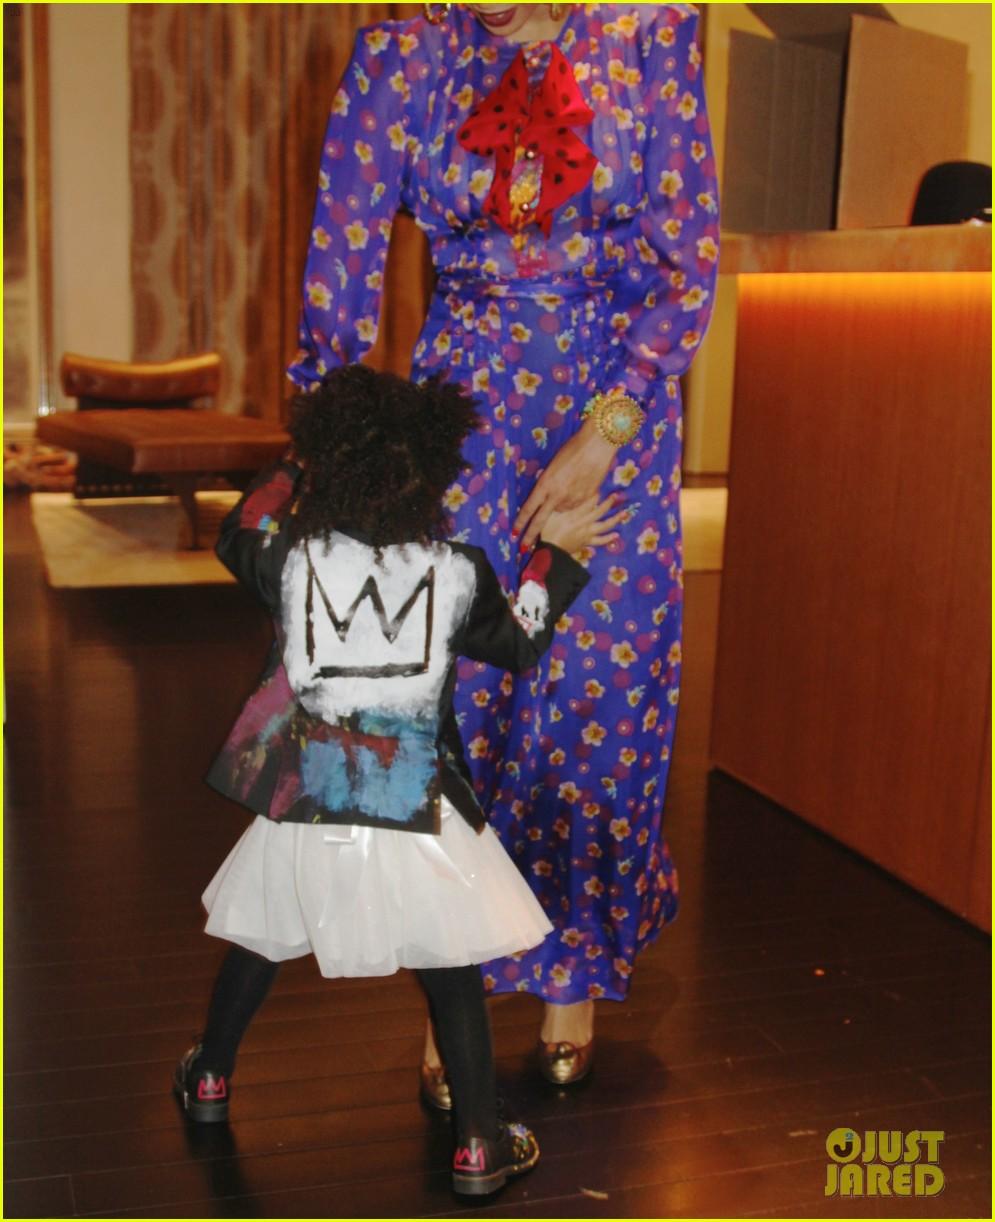 Beyonce Stuns As Frida Kahlo For Second Halloween Costume: Photo ...